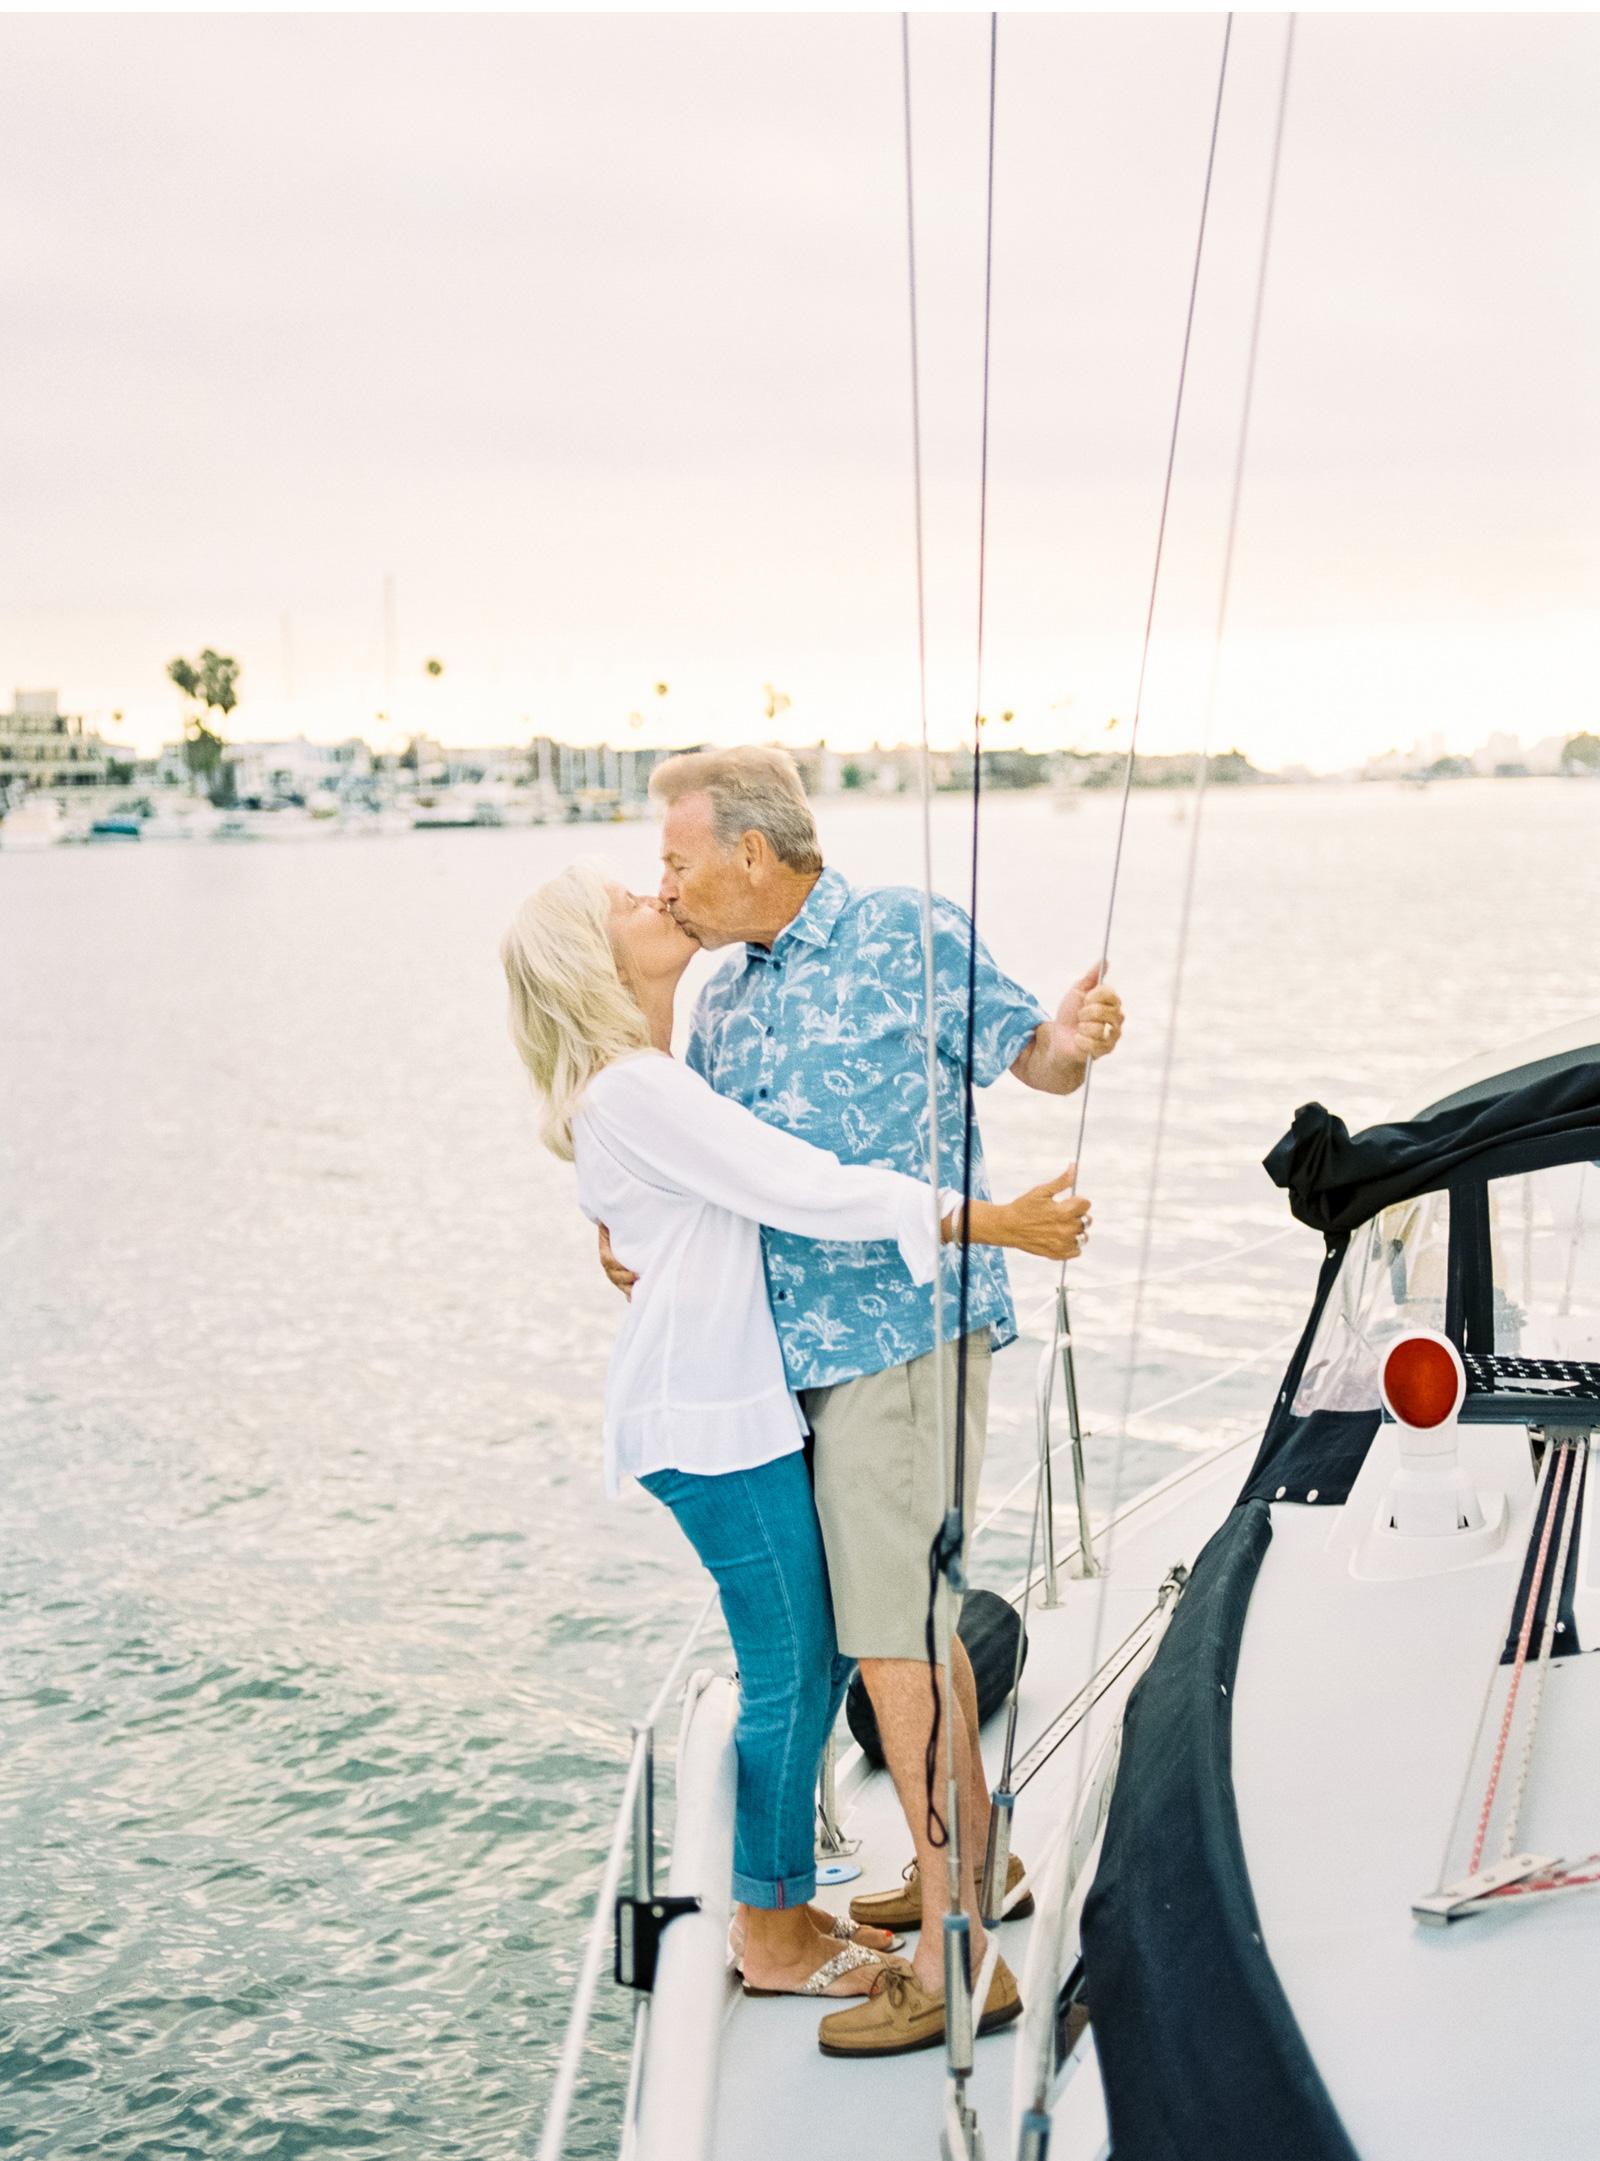 Anniversaries-on-the-Water-Long-Beach-Anniversary-Southern-California-Wedding-Photographer-Fine-Art-Wedding-Photos-Anniversary-on-Boat-Natalie-Schutt-Photography_12.jpg